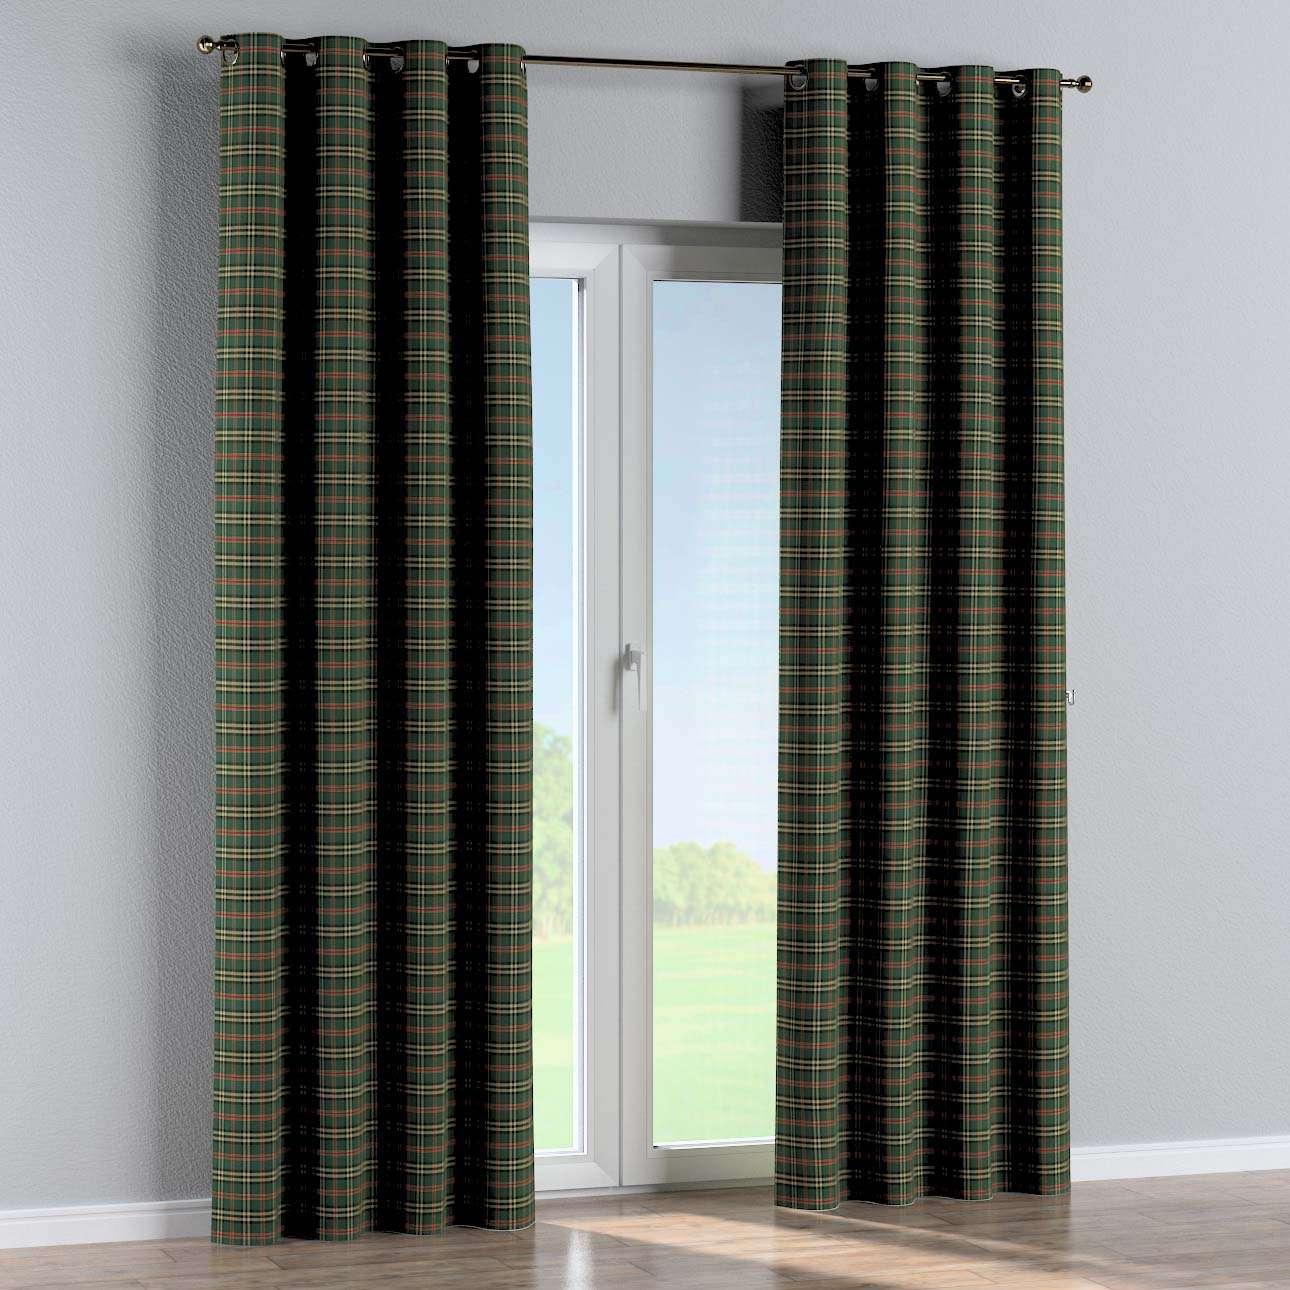 Záves s kolieskami V kolekcii Bristol, tkanina: 142-69